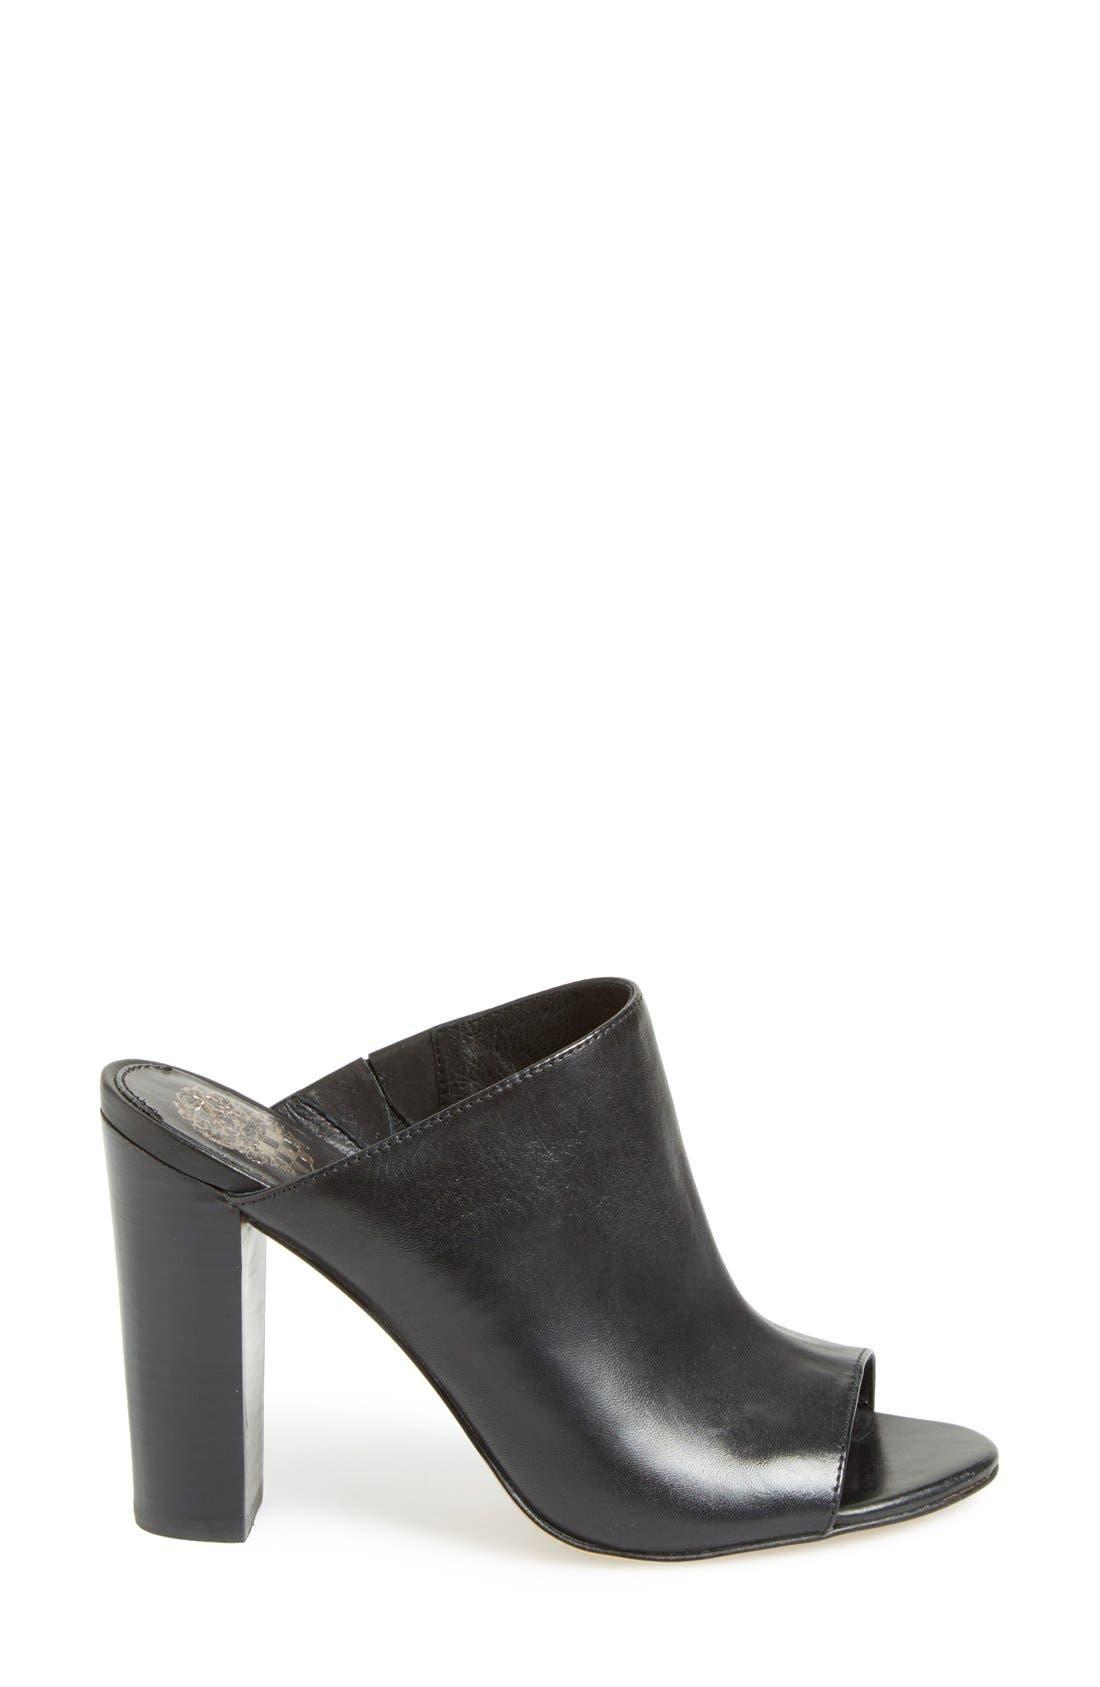 VINCE CAMUTO, 'Vestata' Leather Peep Toe Mule, Alternate thumbnail 6, color, 001